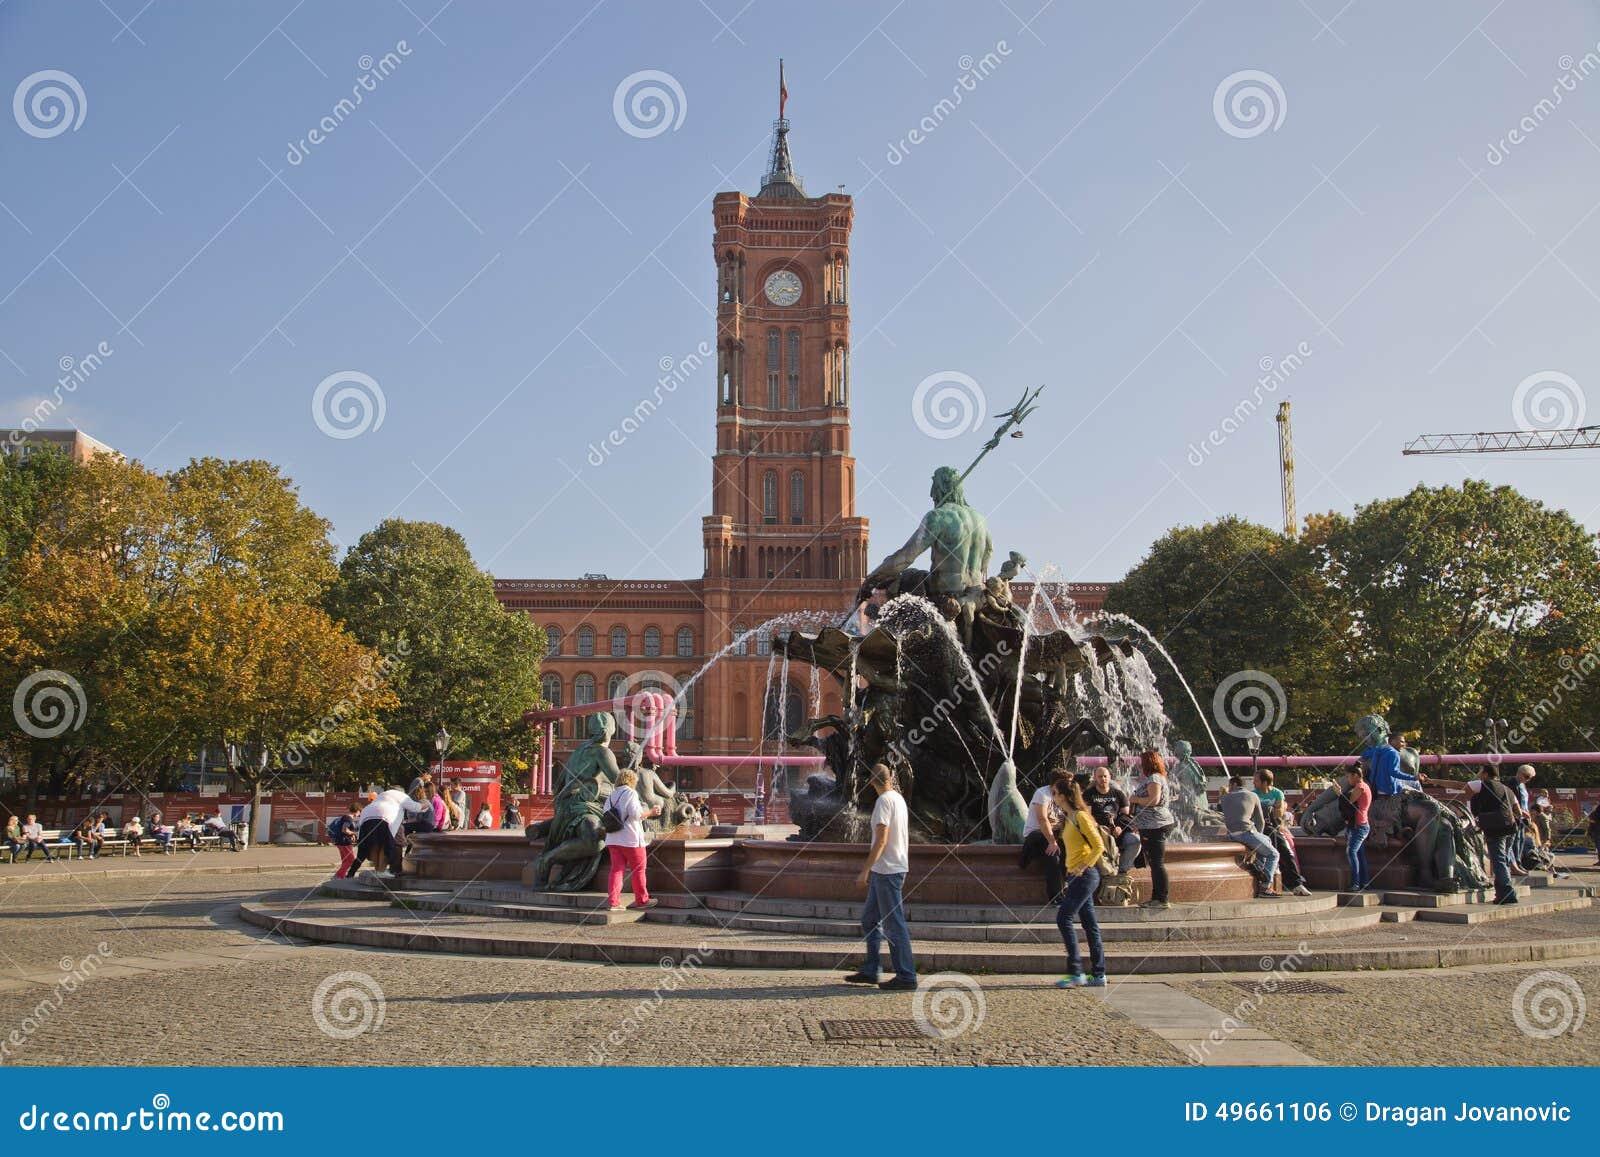 east german capital